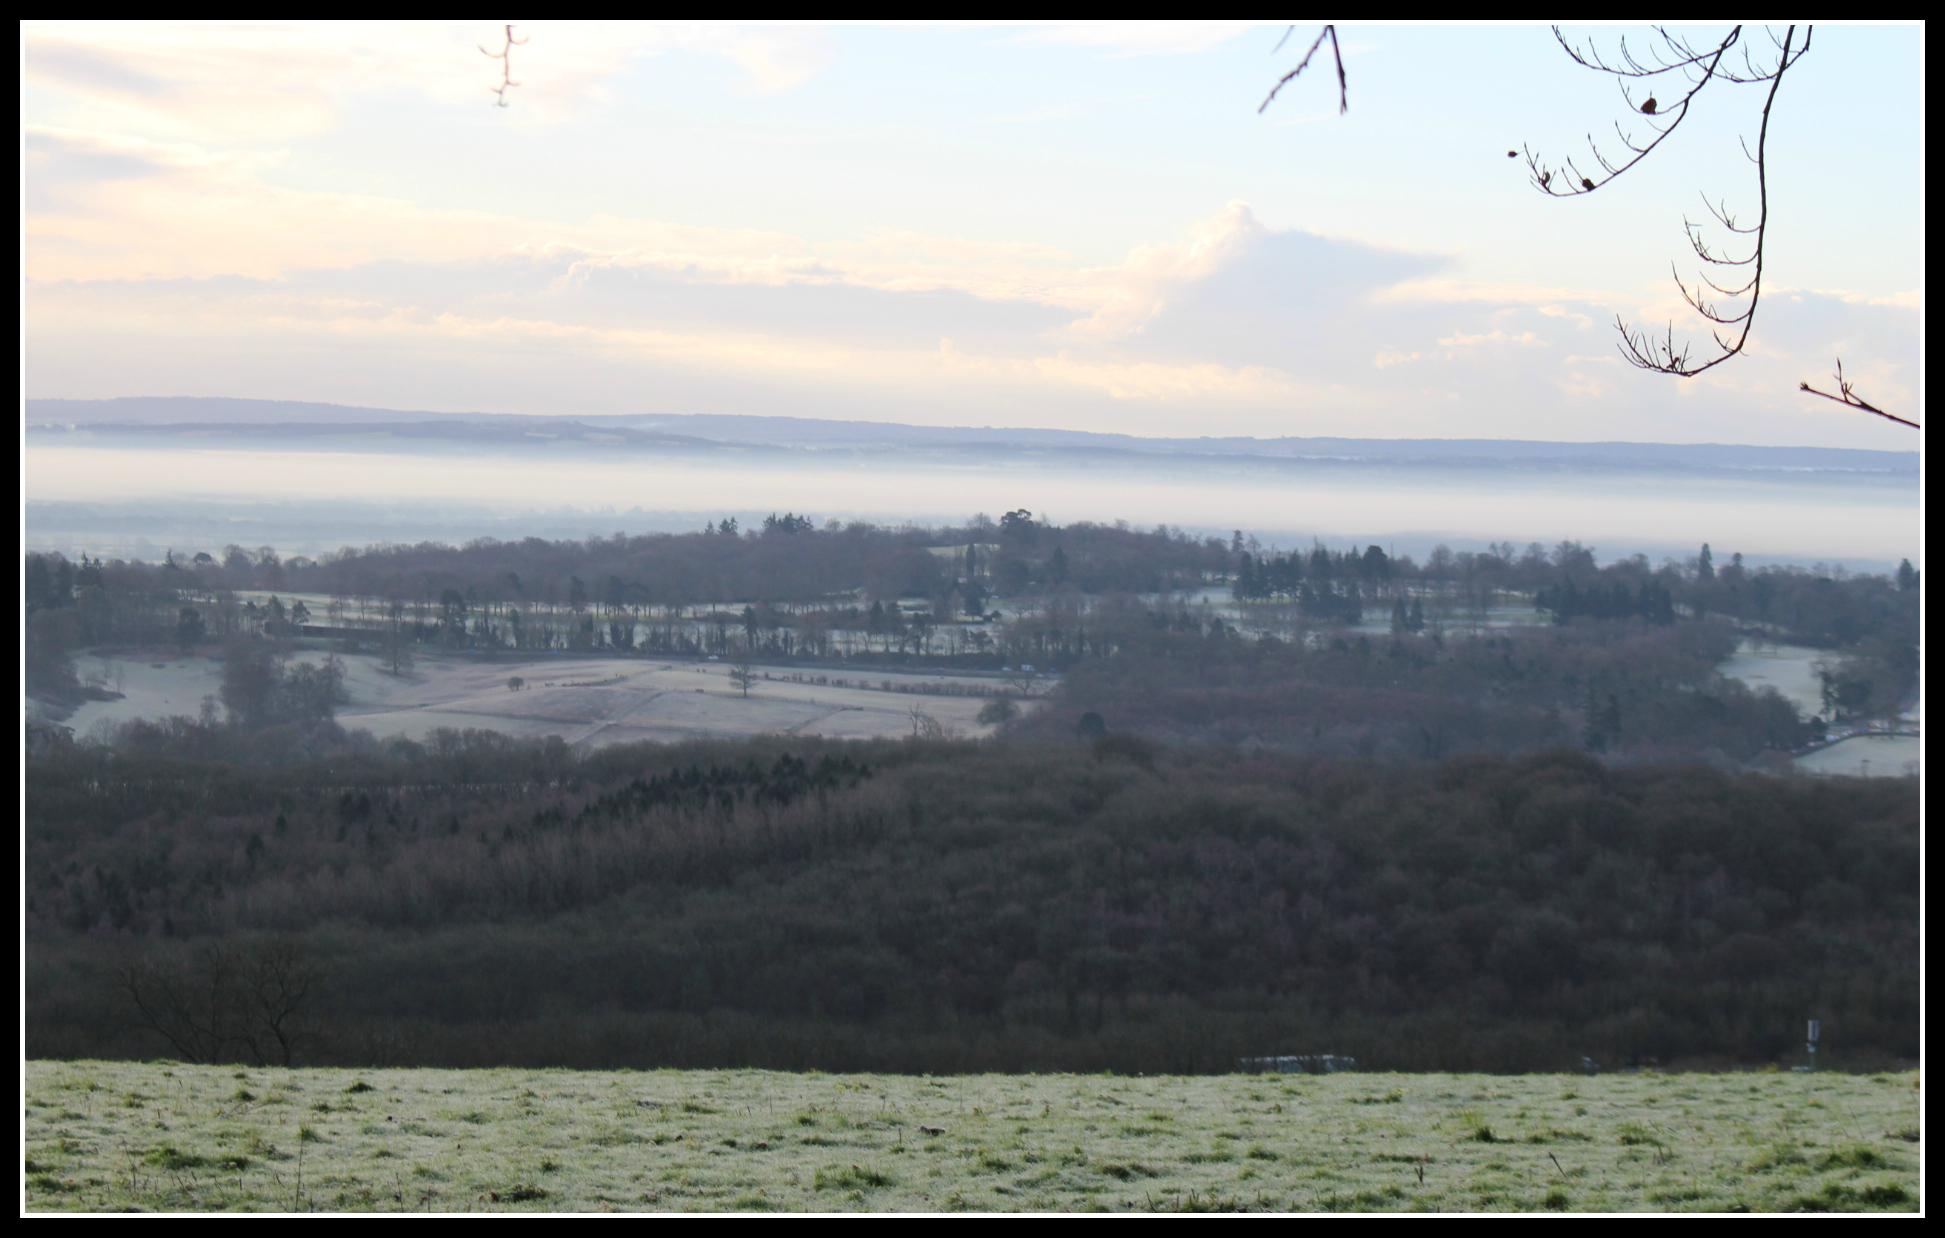 North Downs, East Surrey, landscape, East Surrey landscape, photography, blogging